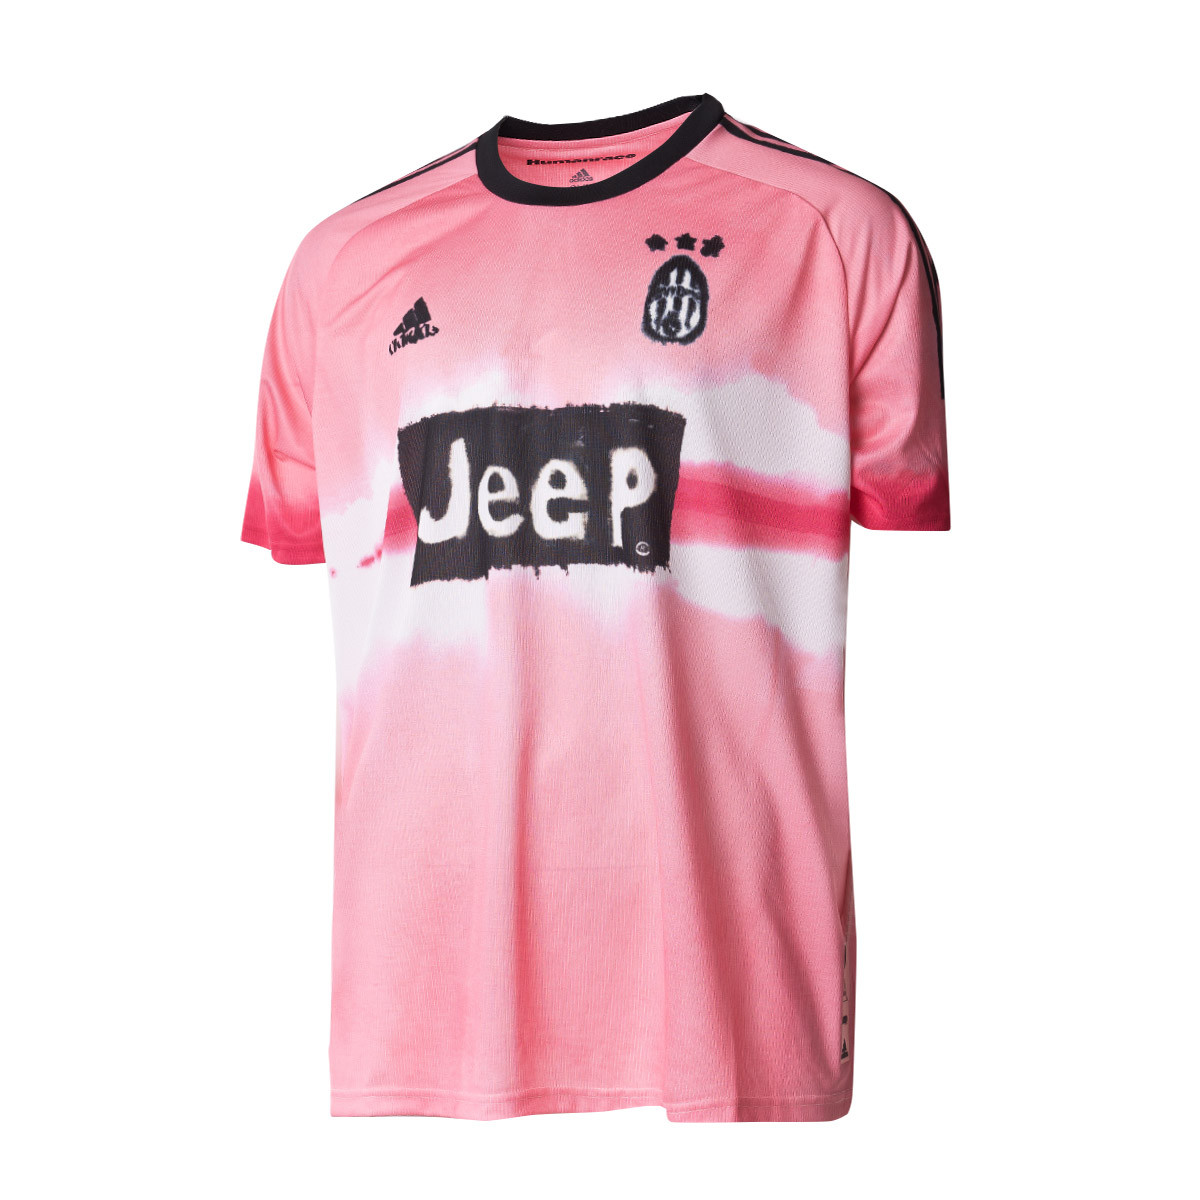 jersey adidas juventus human race 2020 2021 glow pink black football store futbol emotion adidas juventus human race 2020 2021 jersey